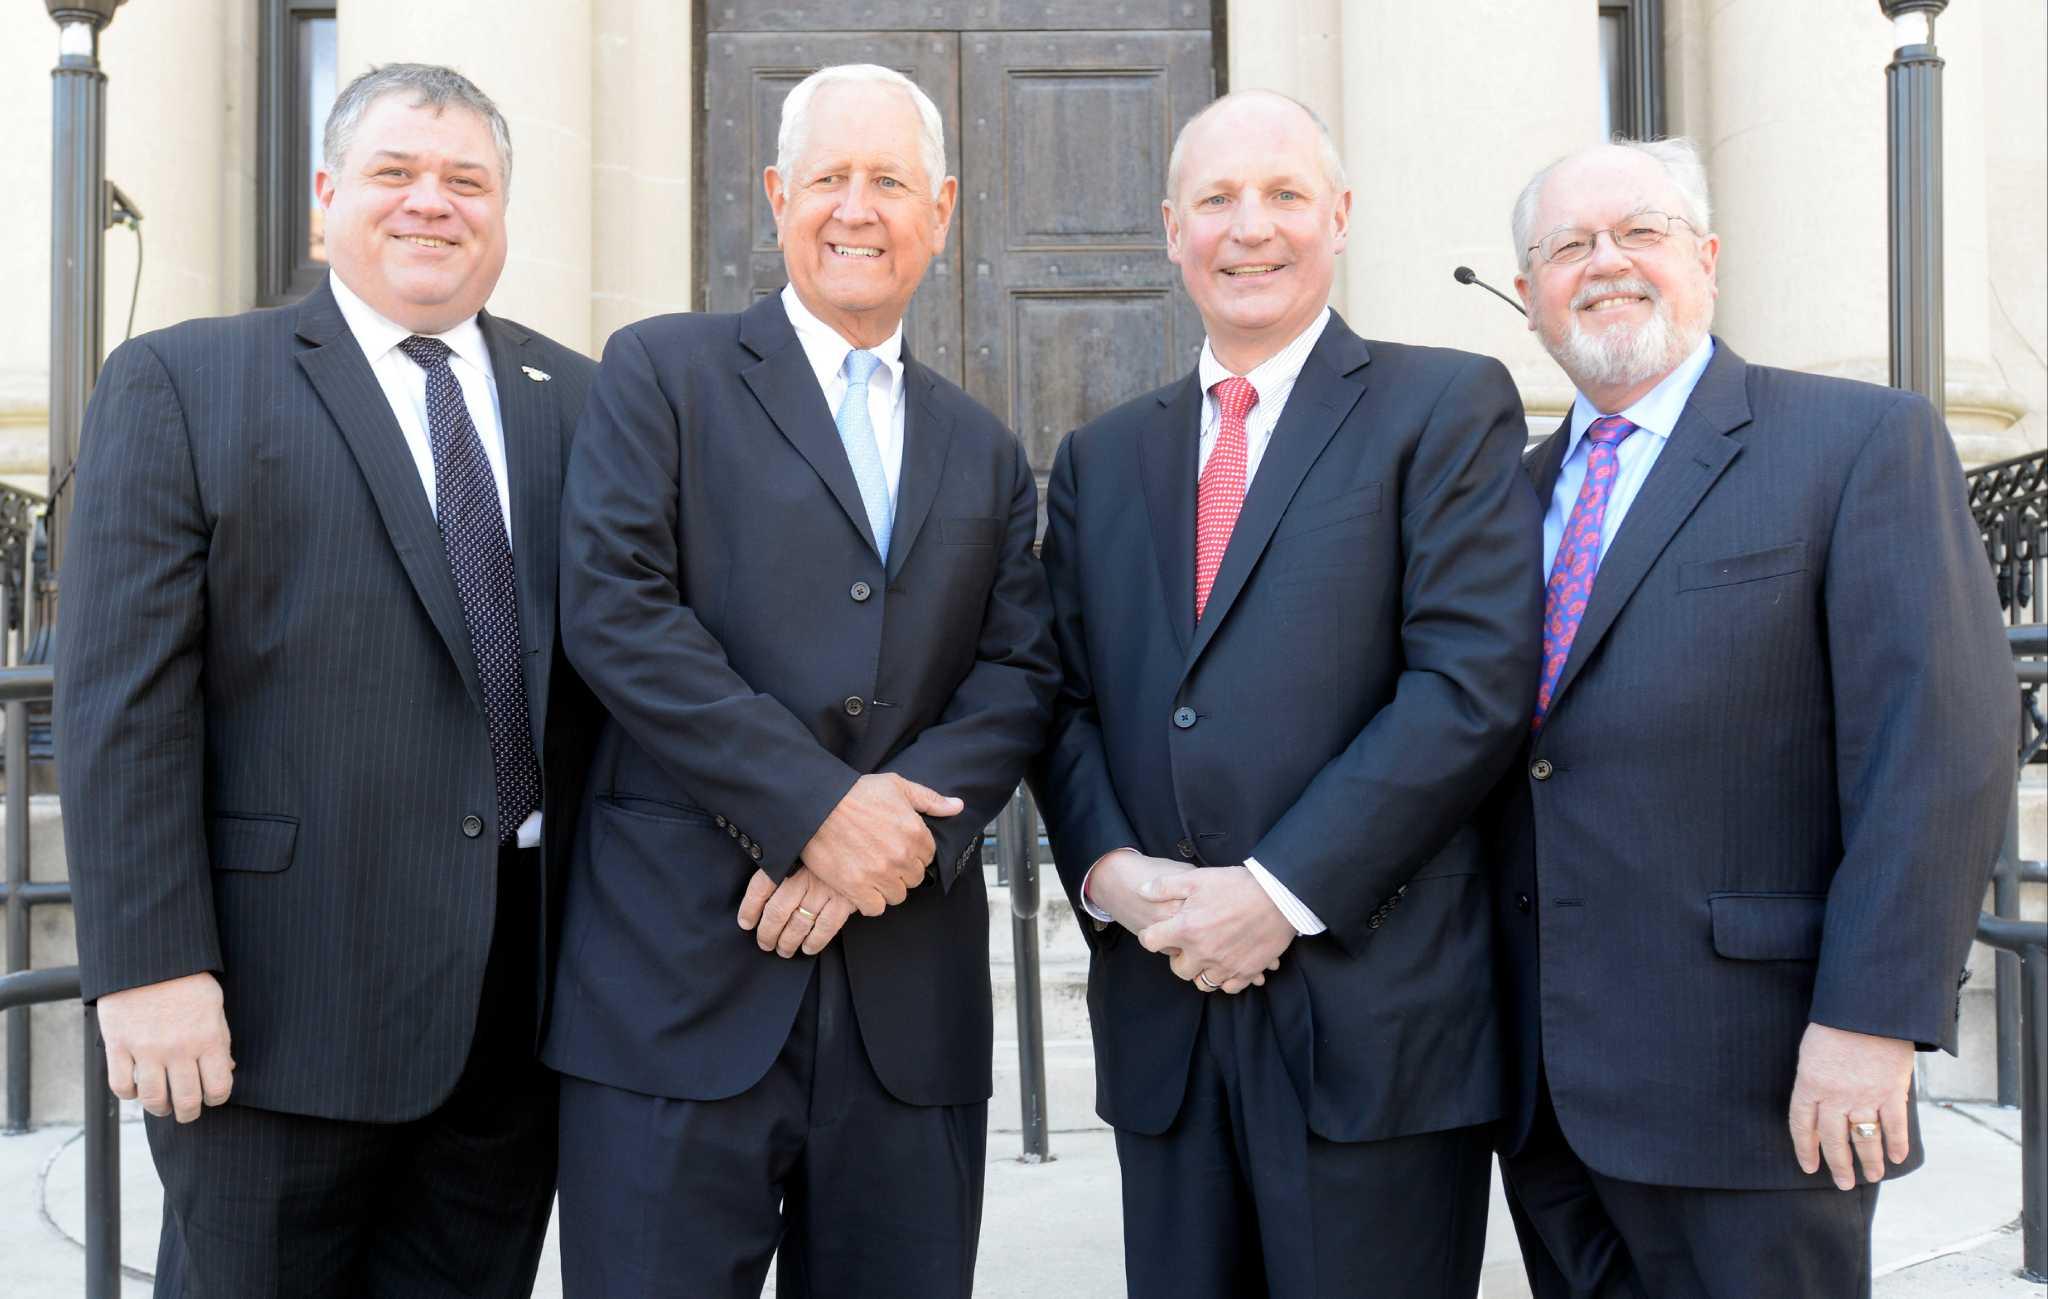 Gillespie newspaper family leaves $70 million to Stamford nonprofits